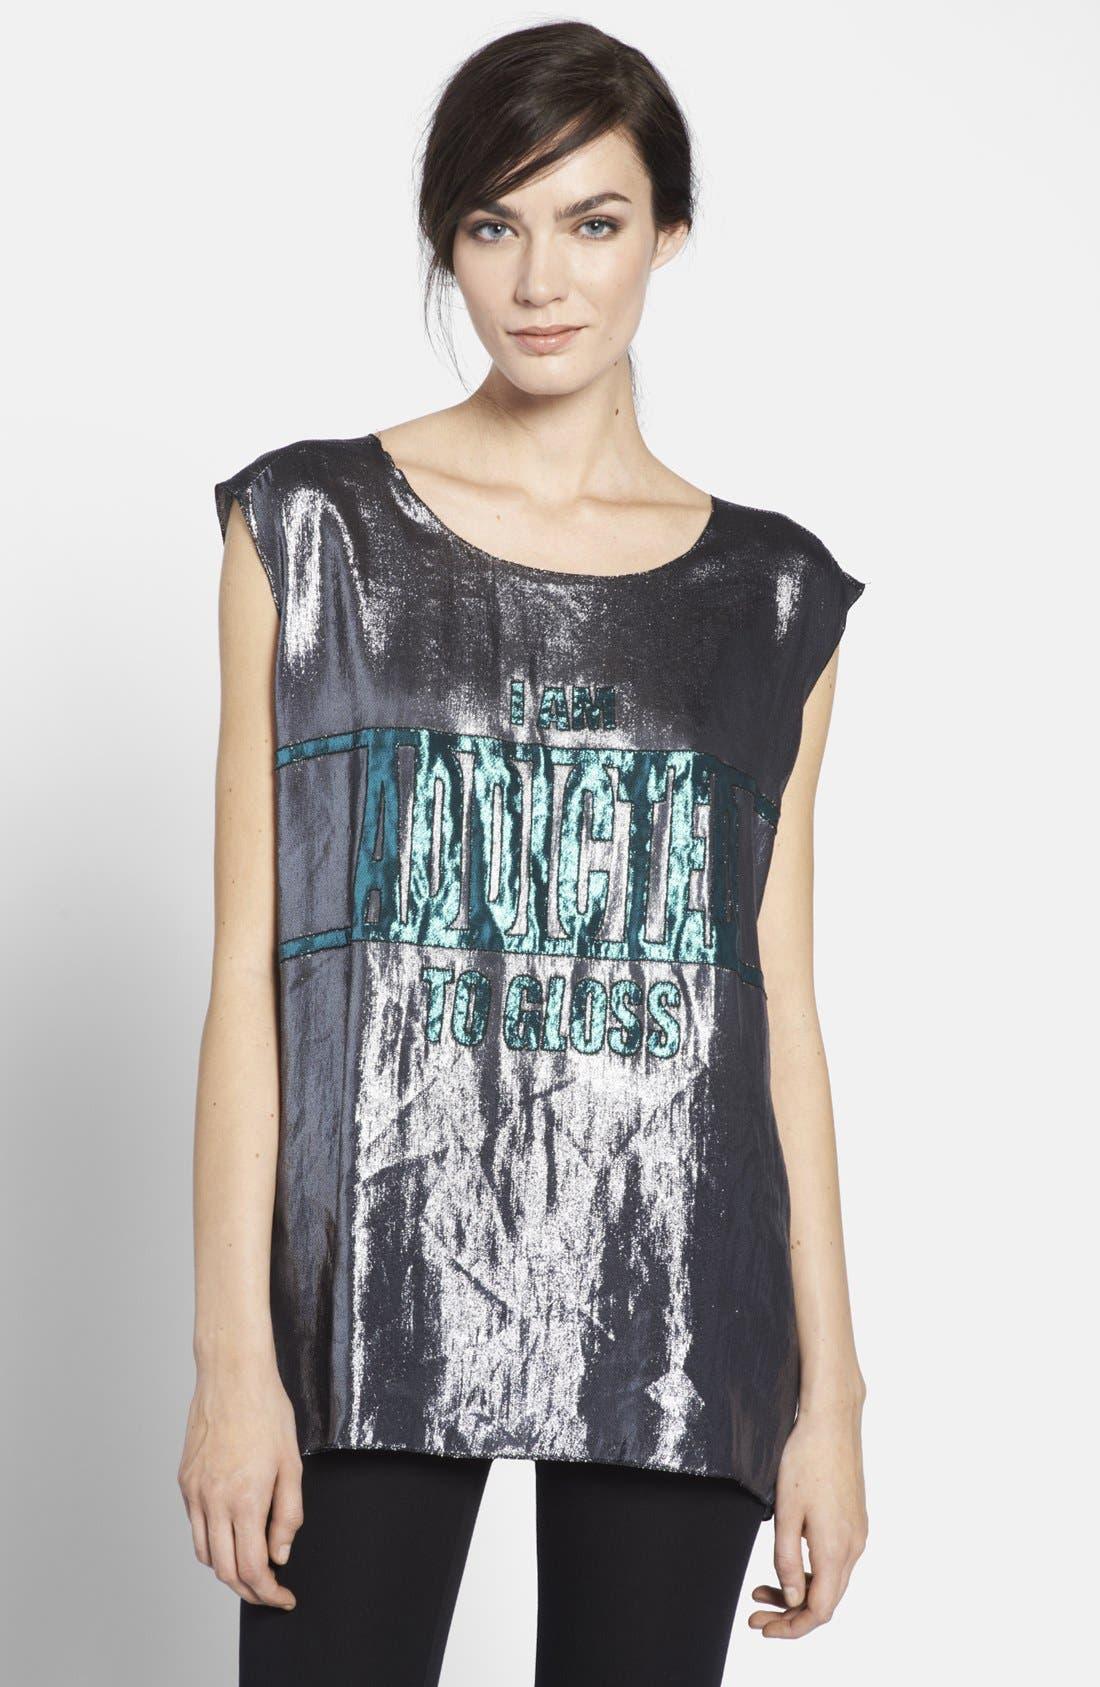 Main Image - Lanvin 'I Am Addicted to Gloss' Lamé Top